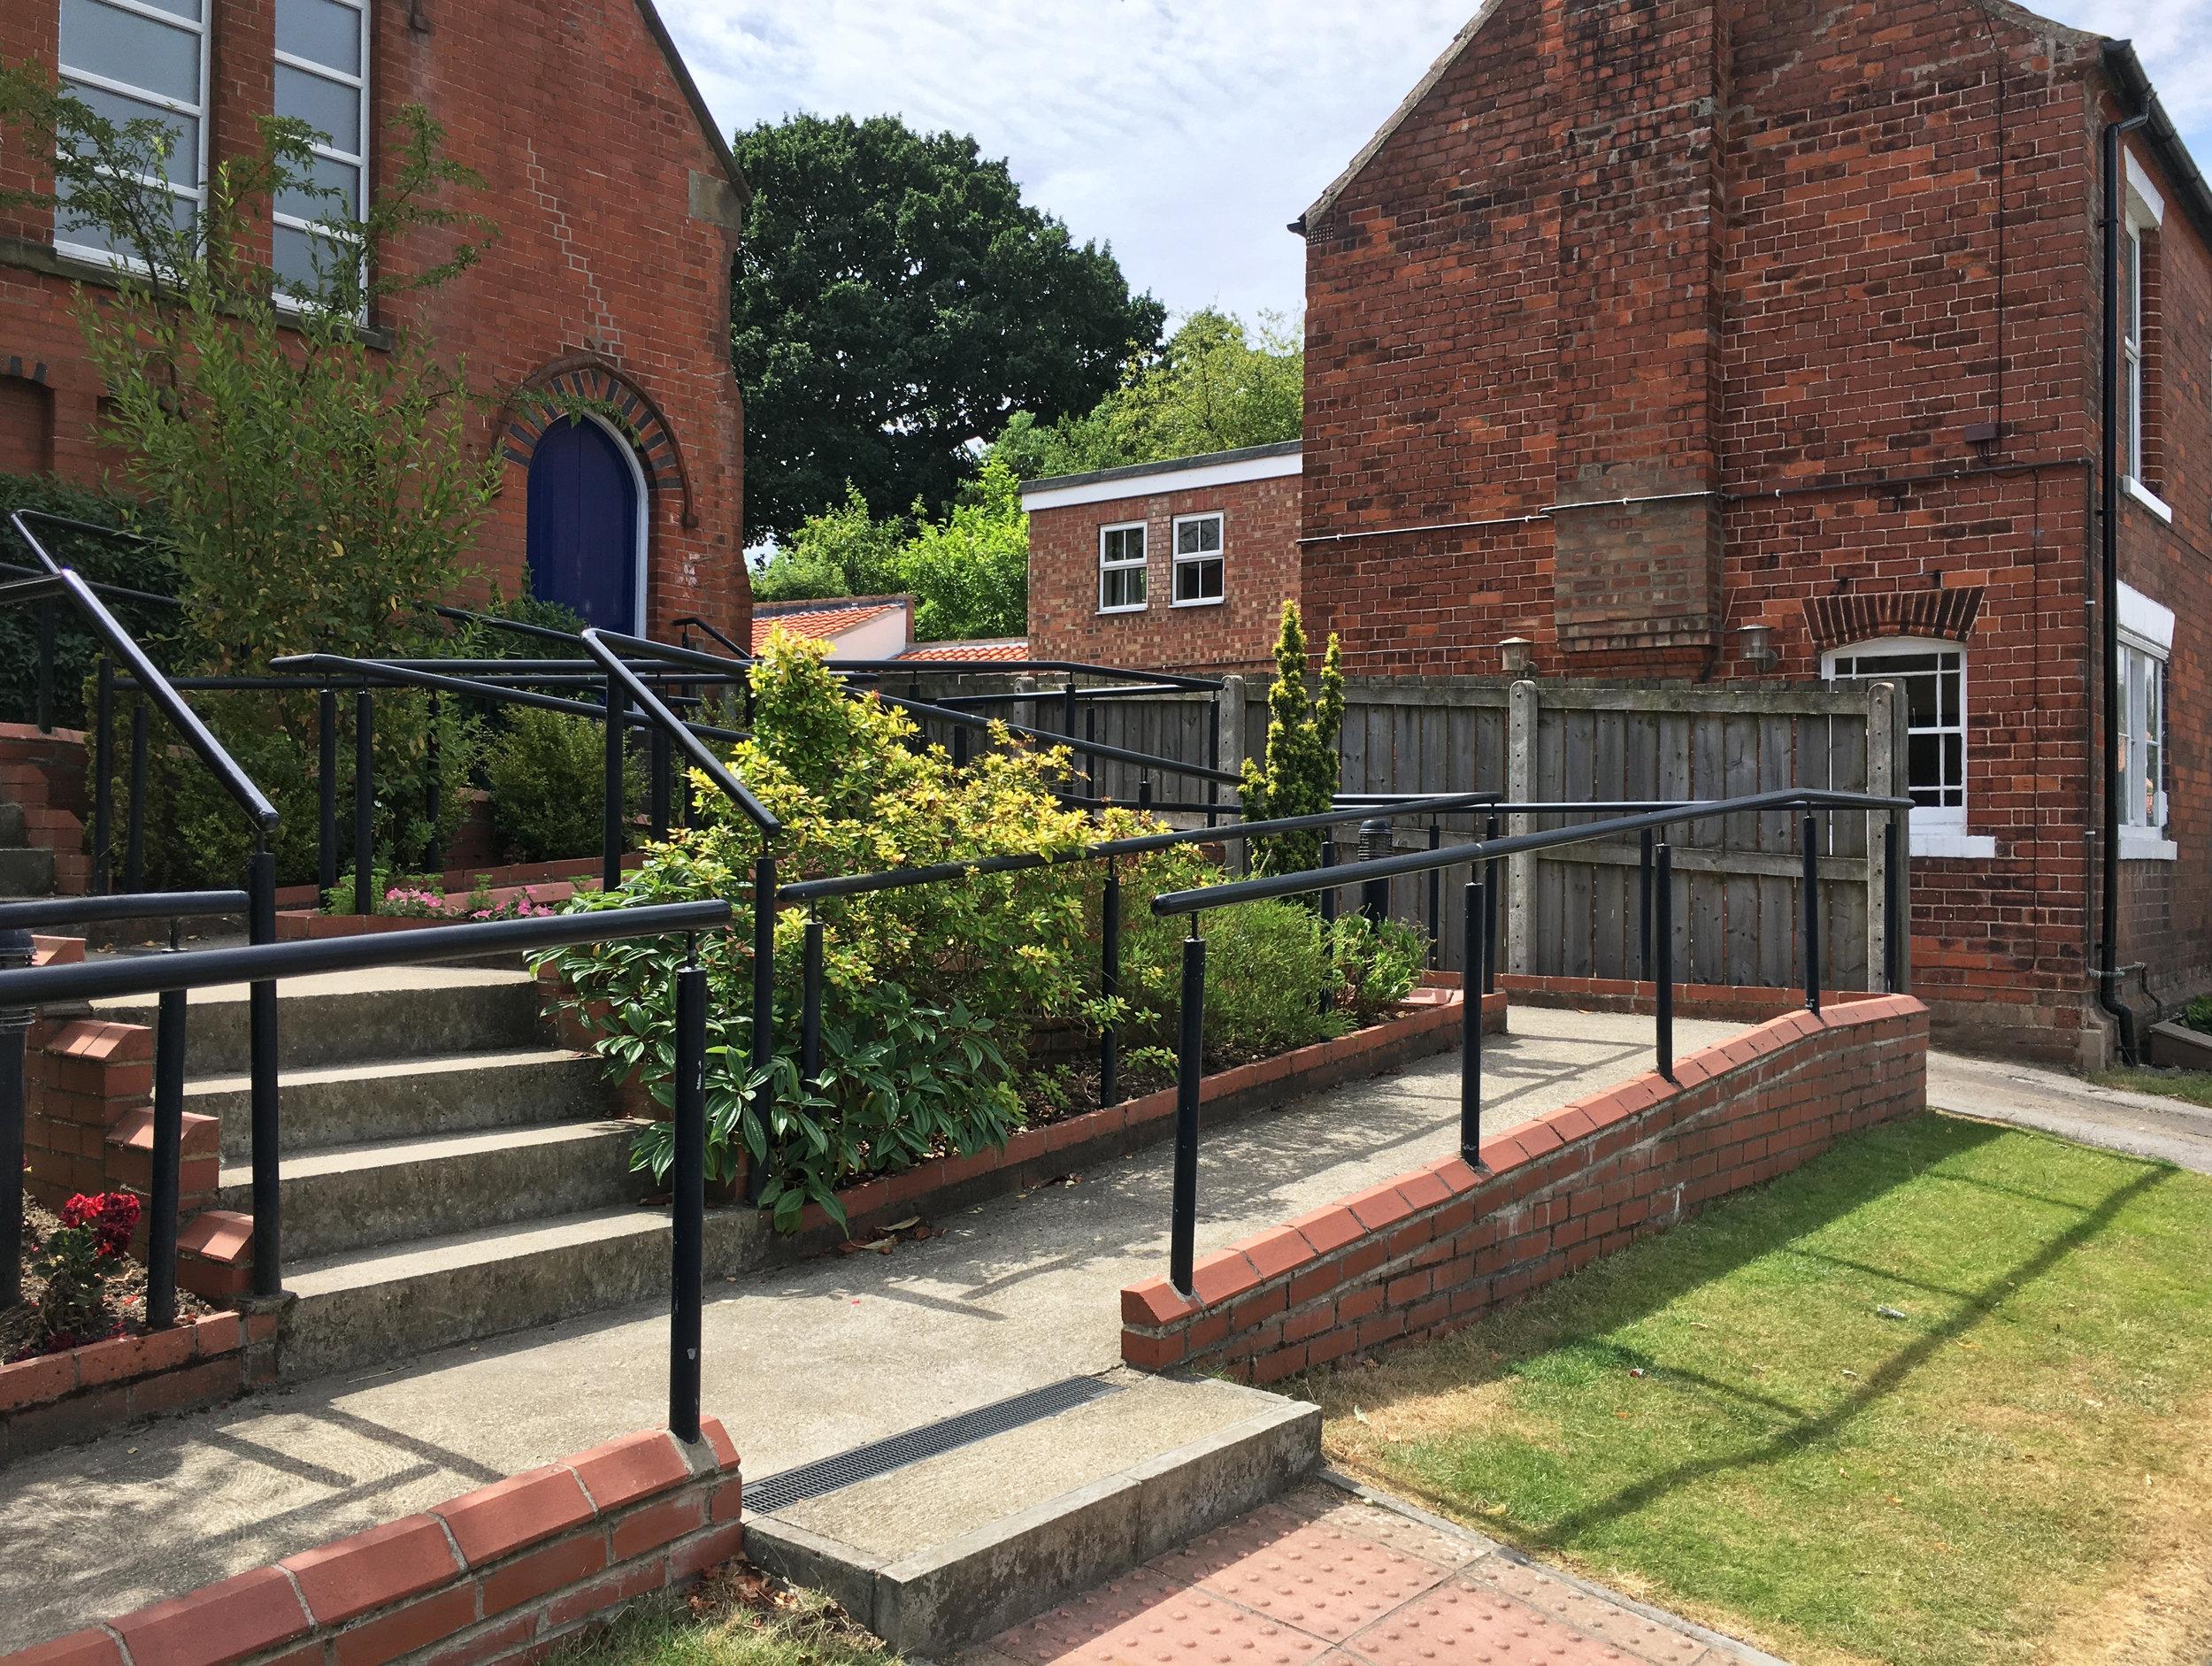 Walkington Methodist Chapel Access 2 - Samuel Kendall Associates - Beverley Architects